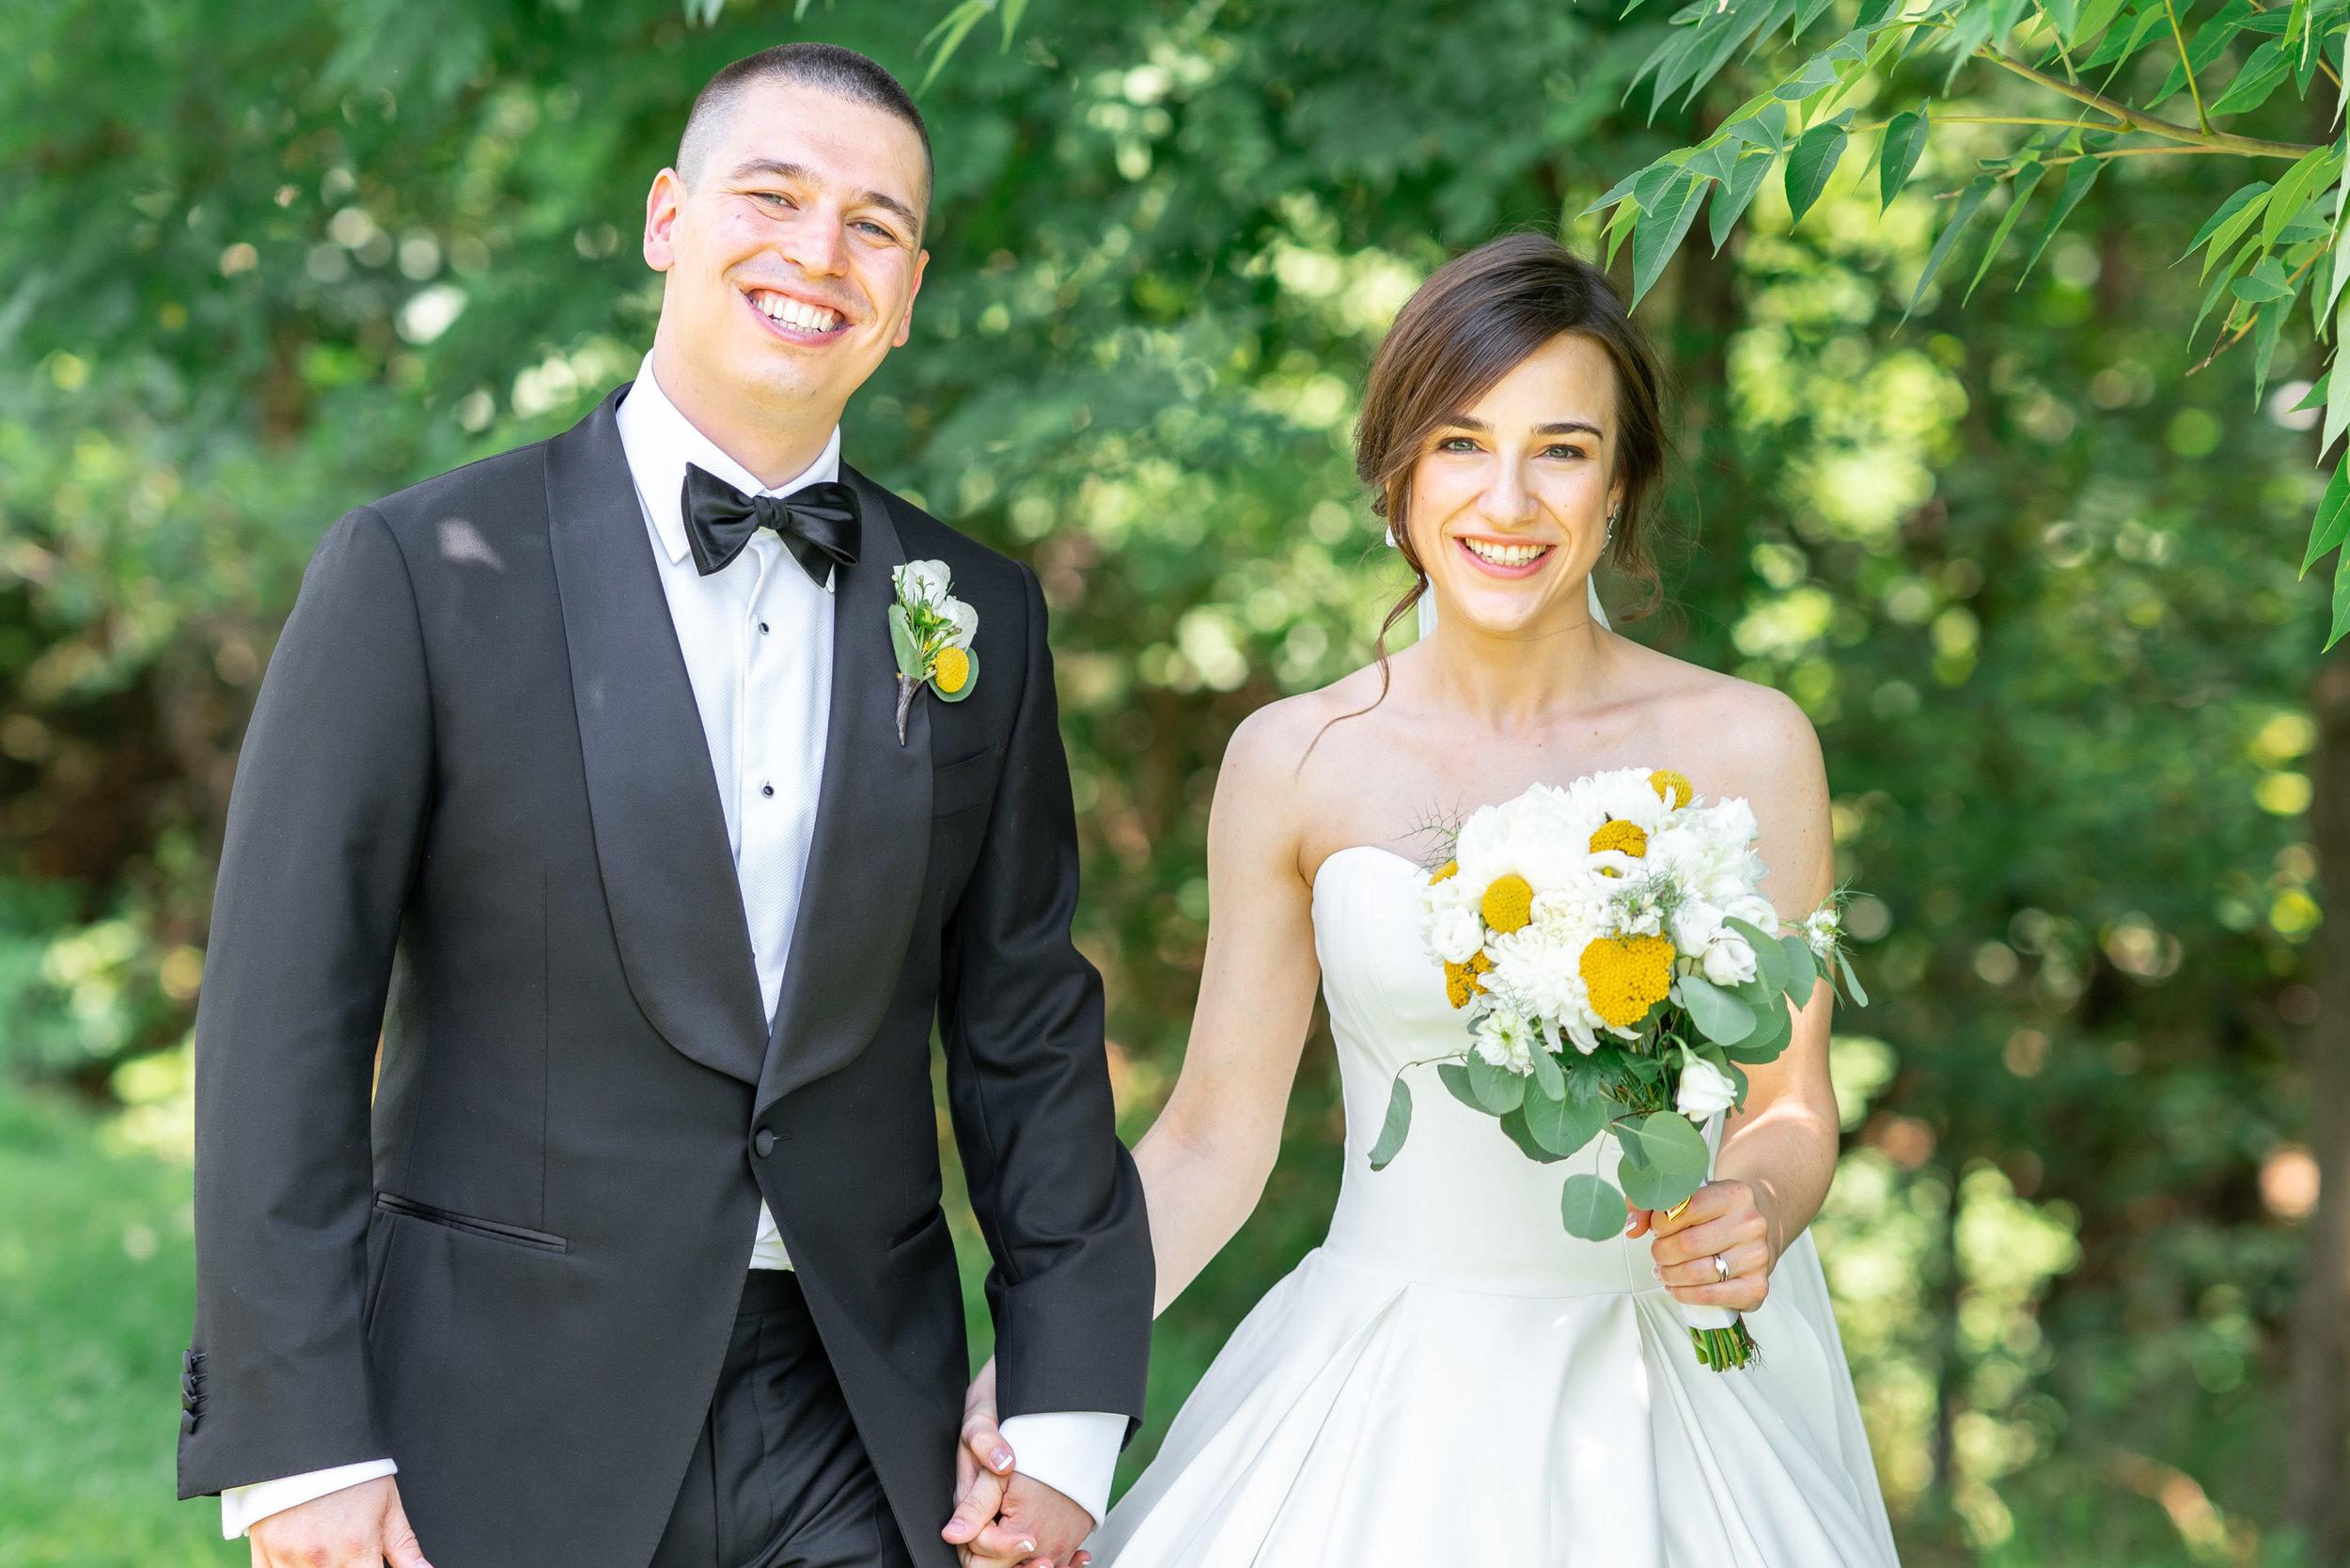 Bride and groom walking at Luray wedding in Shenandoah mountains